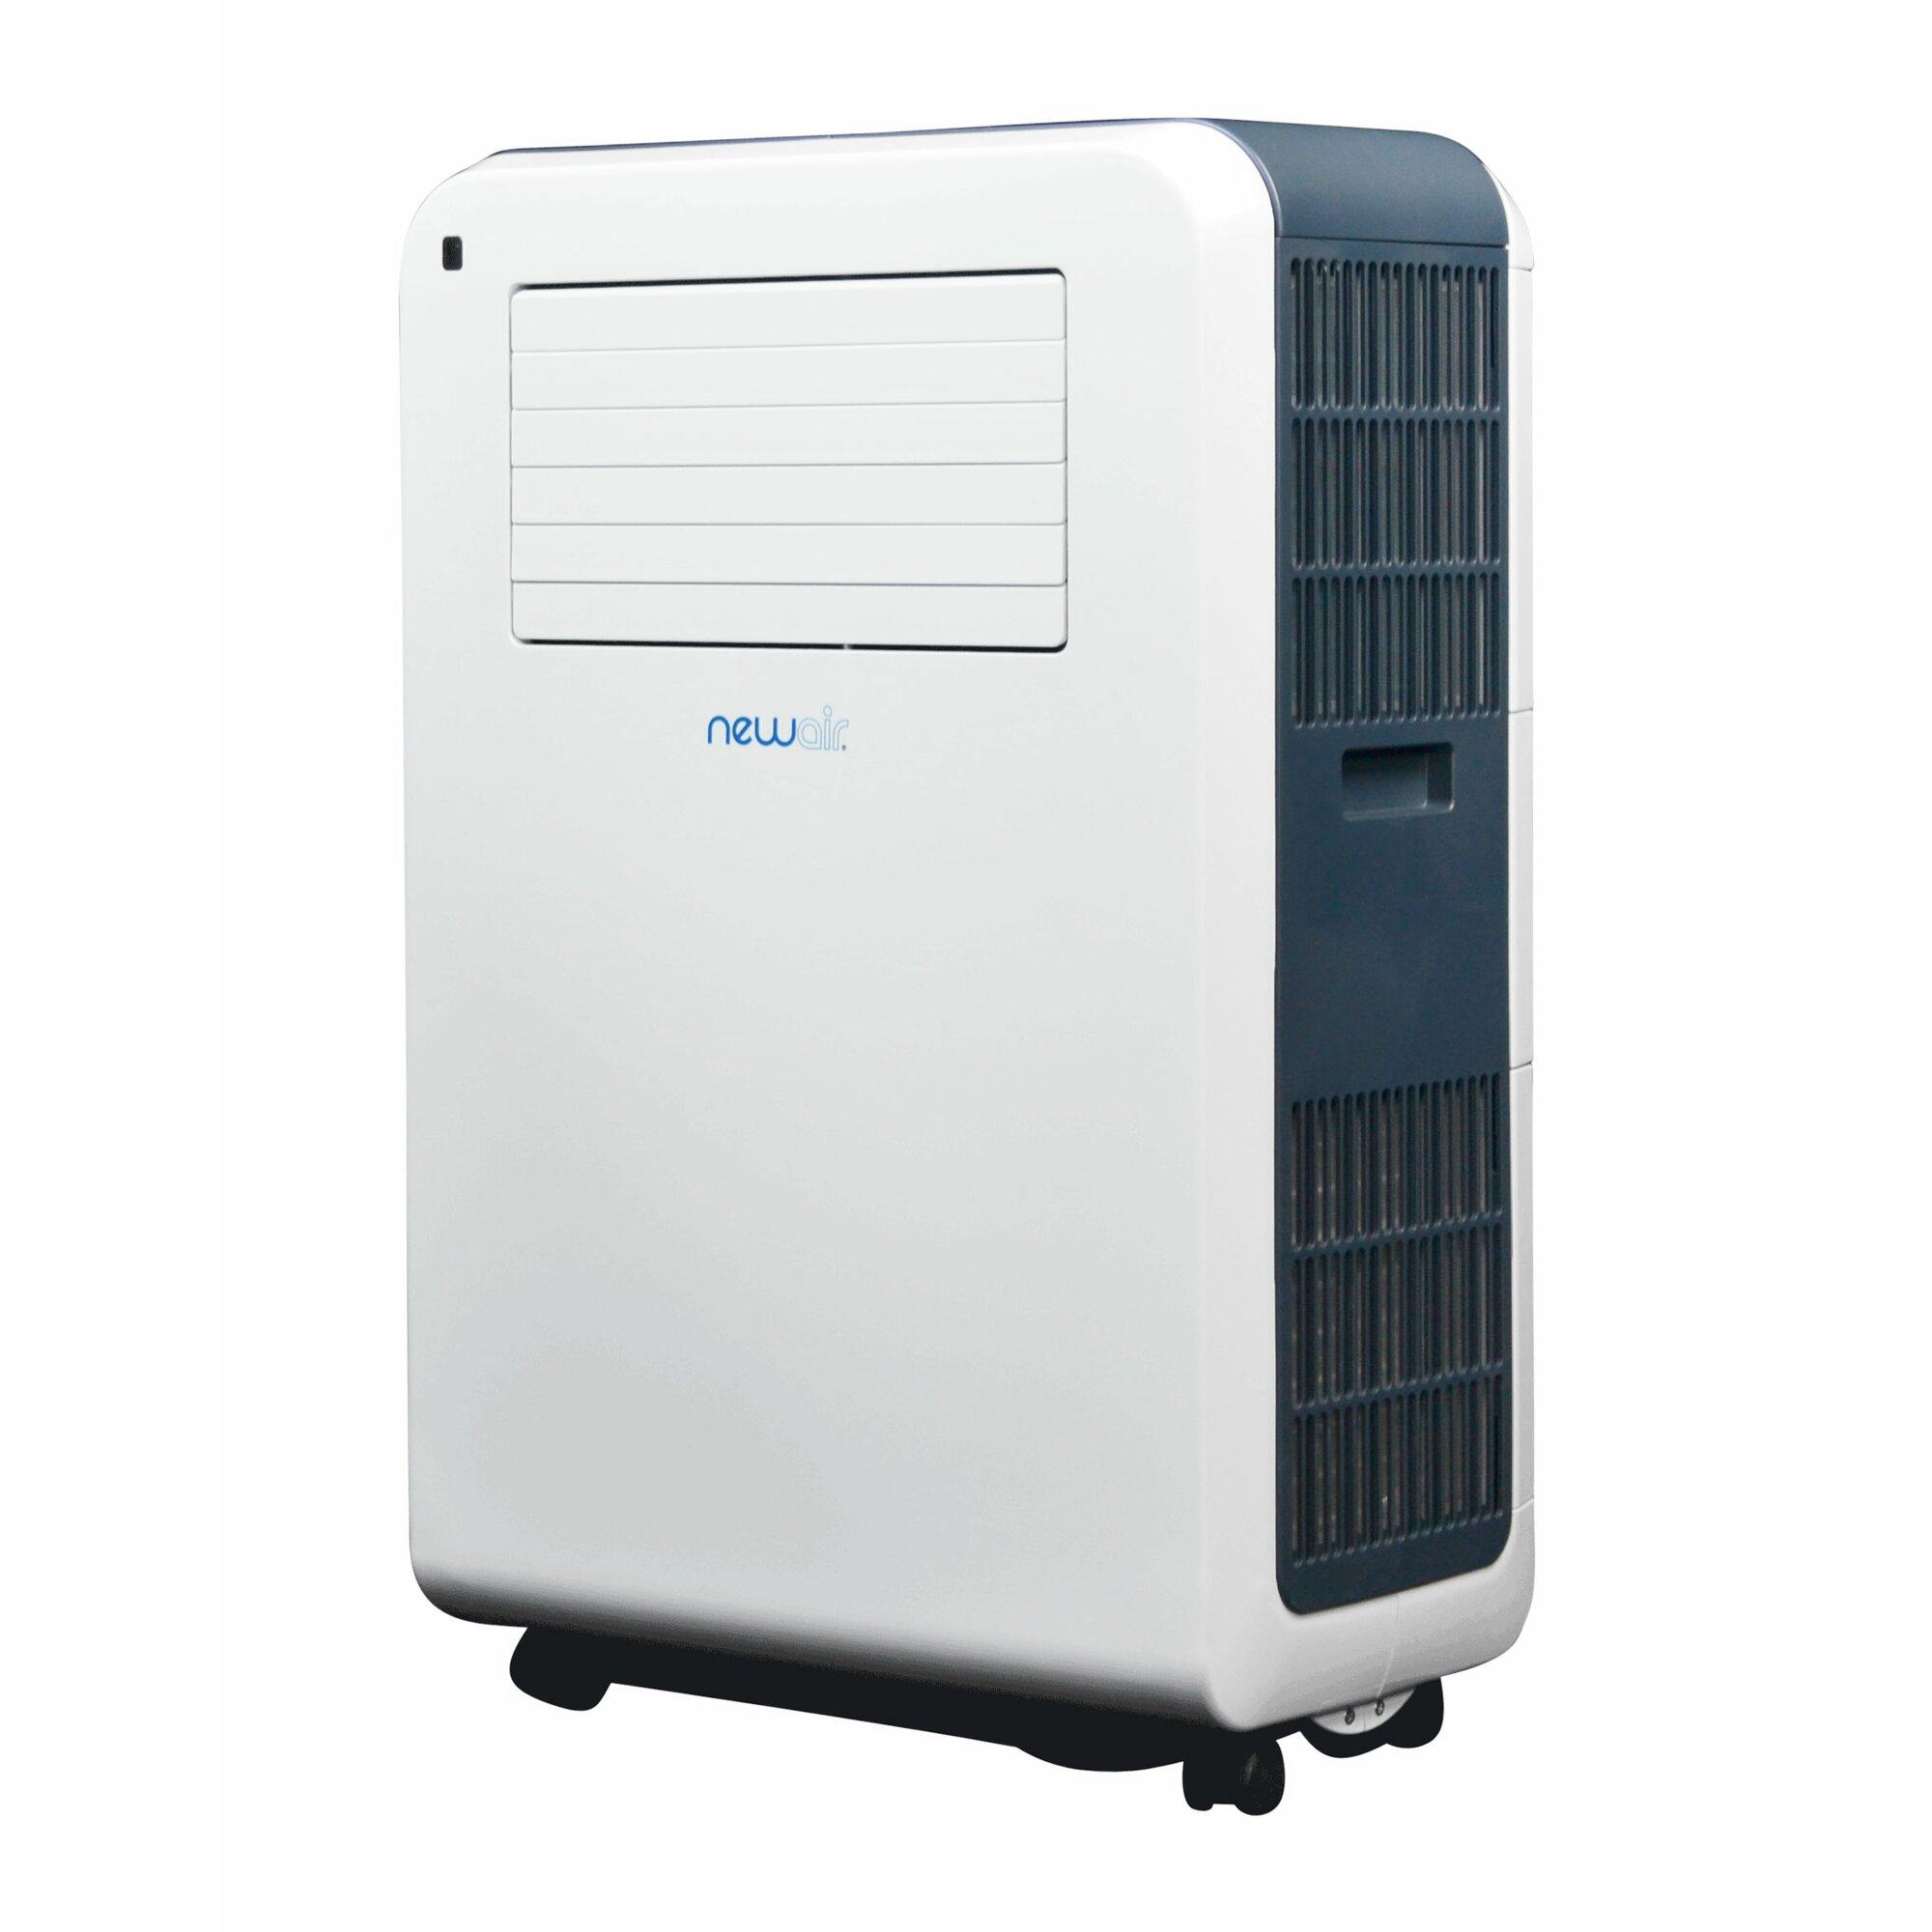 Portable Air Conditioner For 2 Car Garage Grumpy Cat